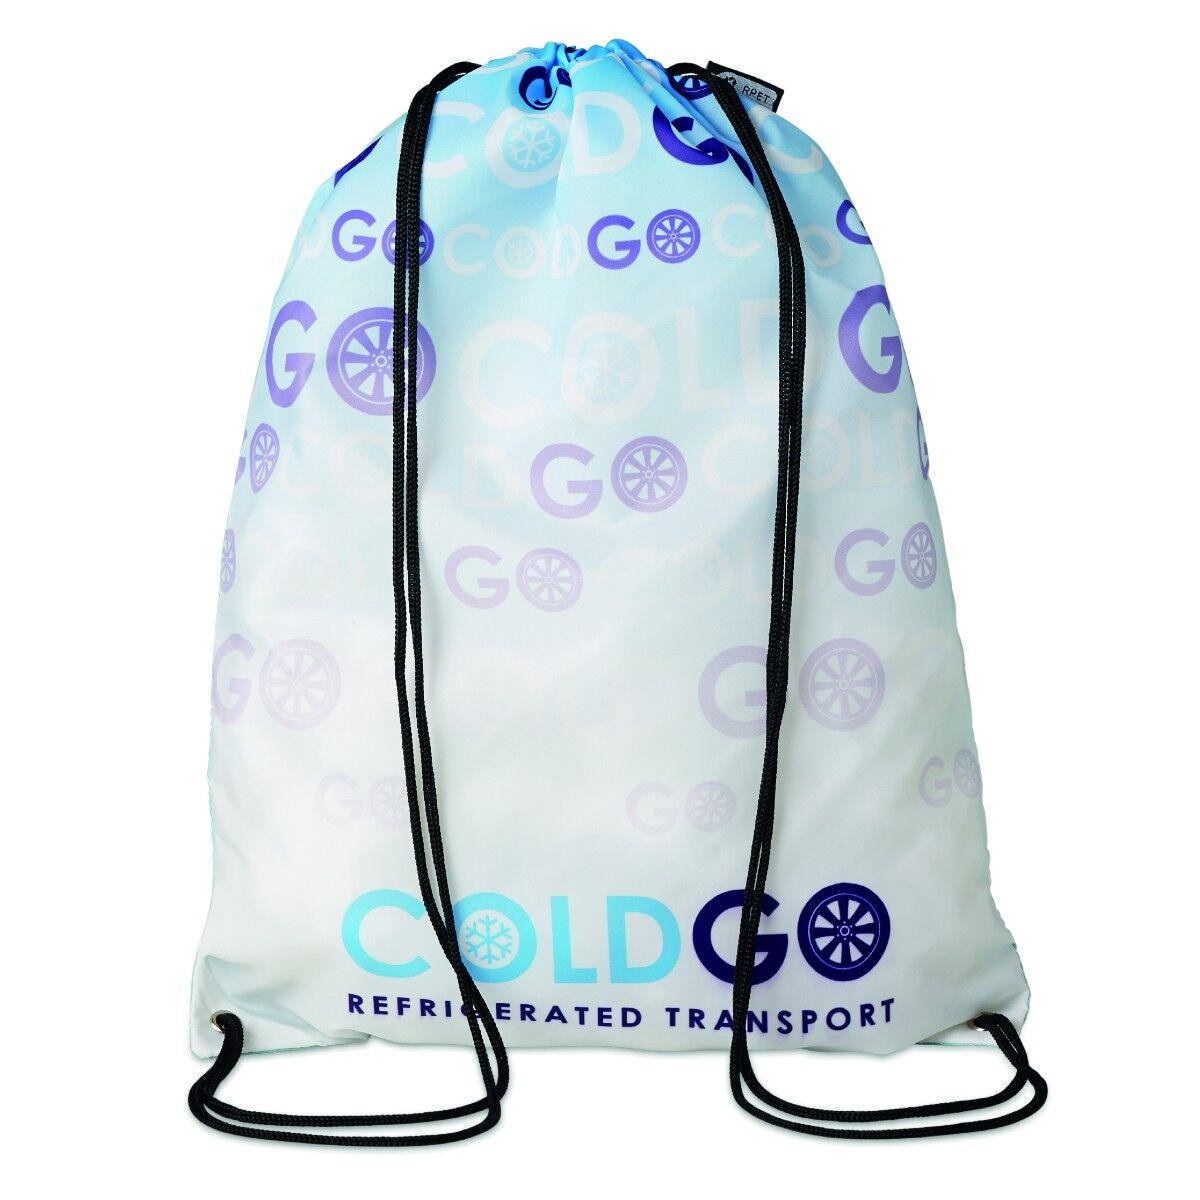 Recycled drawstring Bag Fully Customised